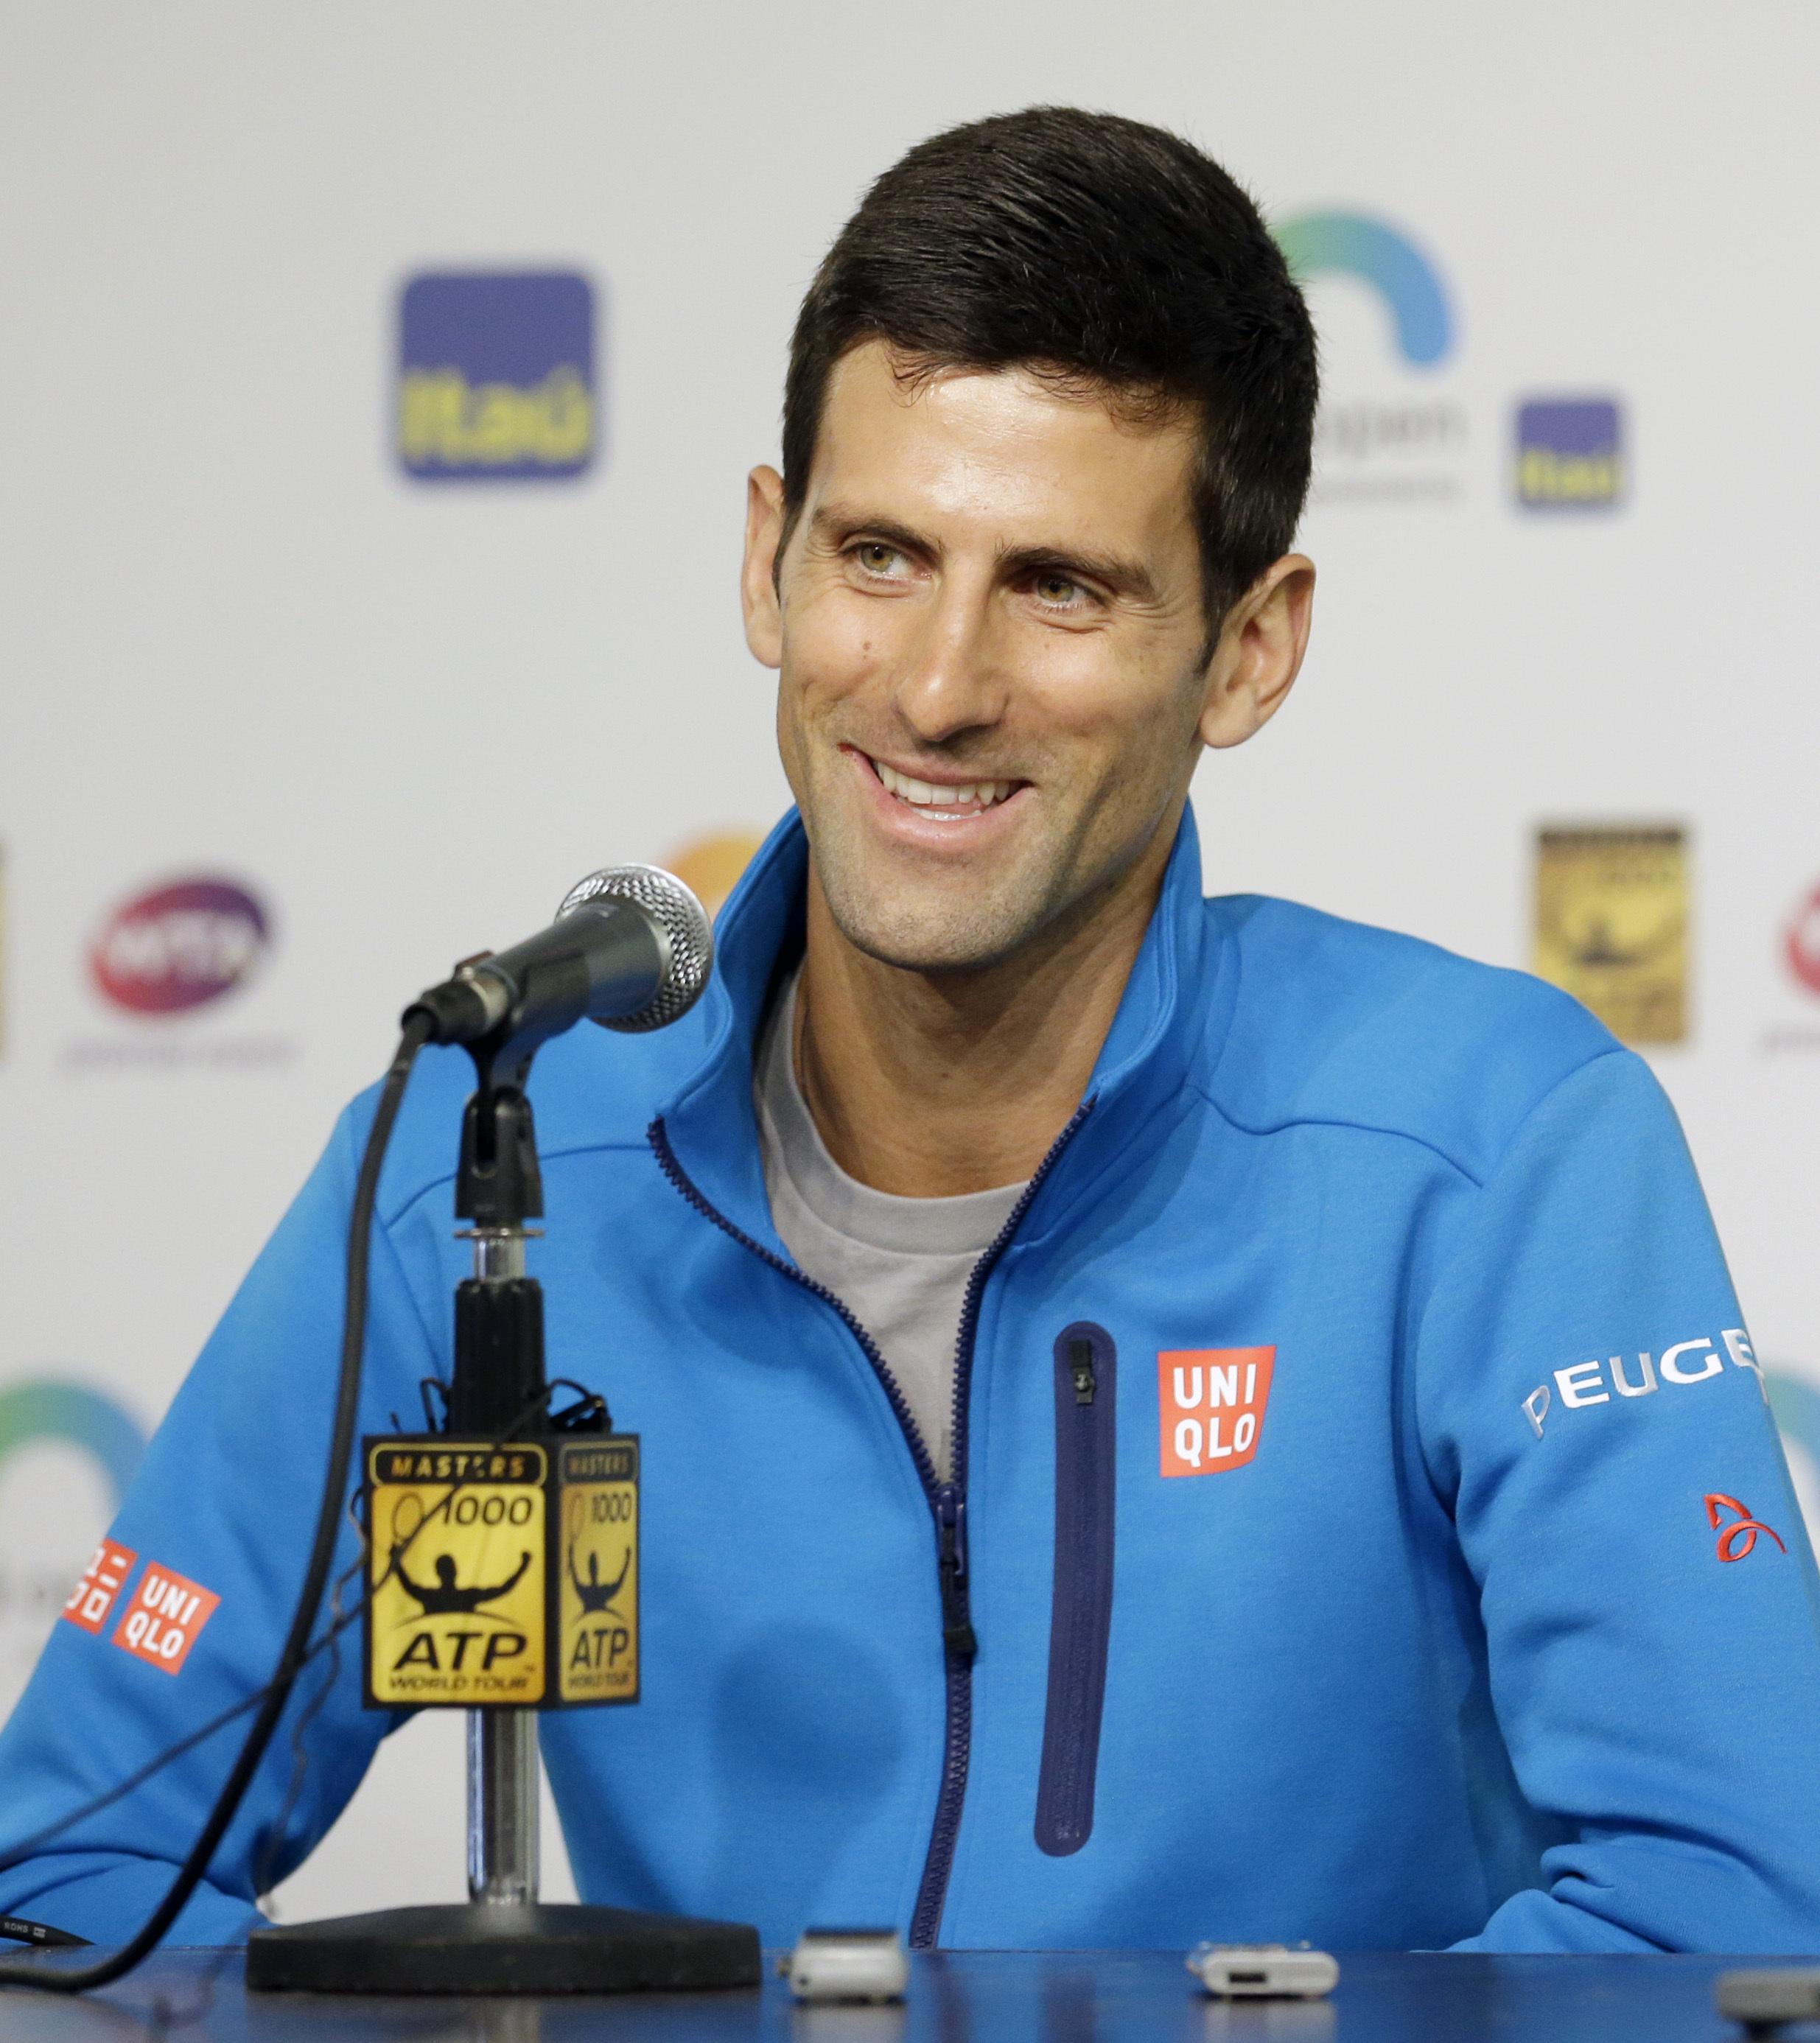 Novak Djokovic, of Serbia, talks to reporters at the Miami Open tennis tournament in Key Biscayne, Fla., Wednesday, March 23, 2016. (AP Photo/Alan Diaz)